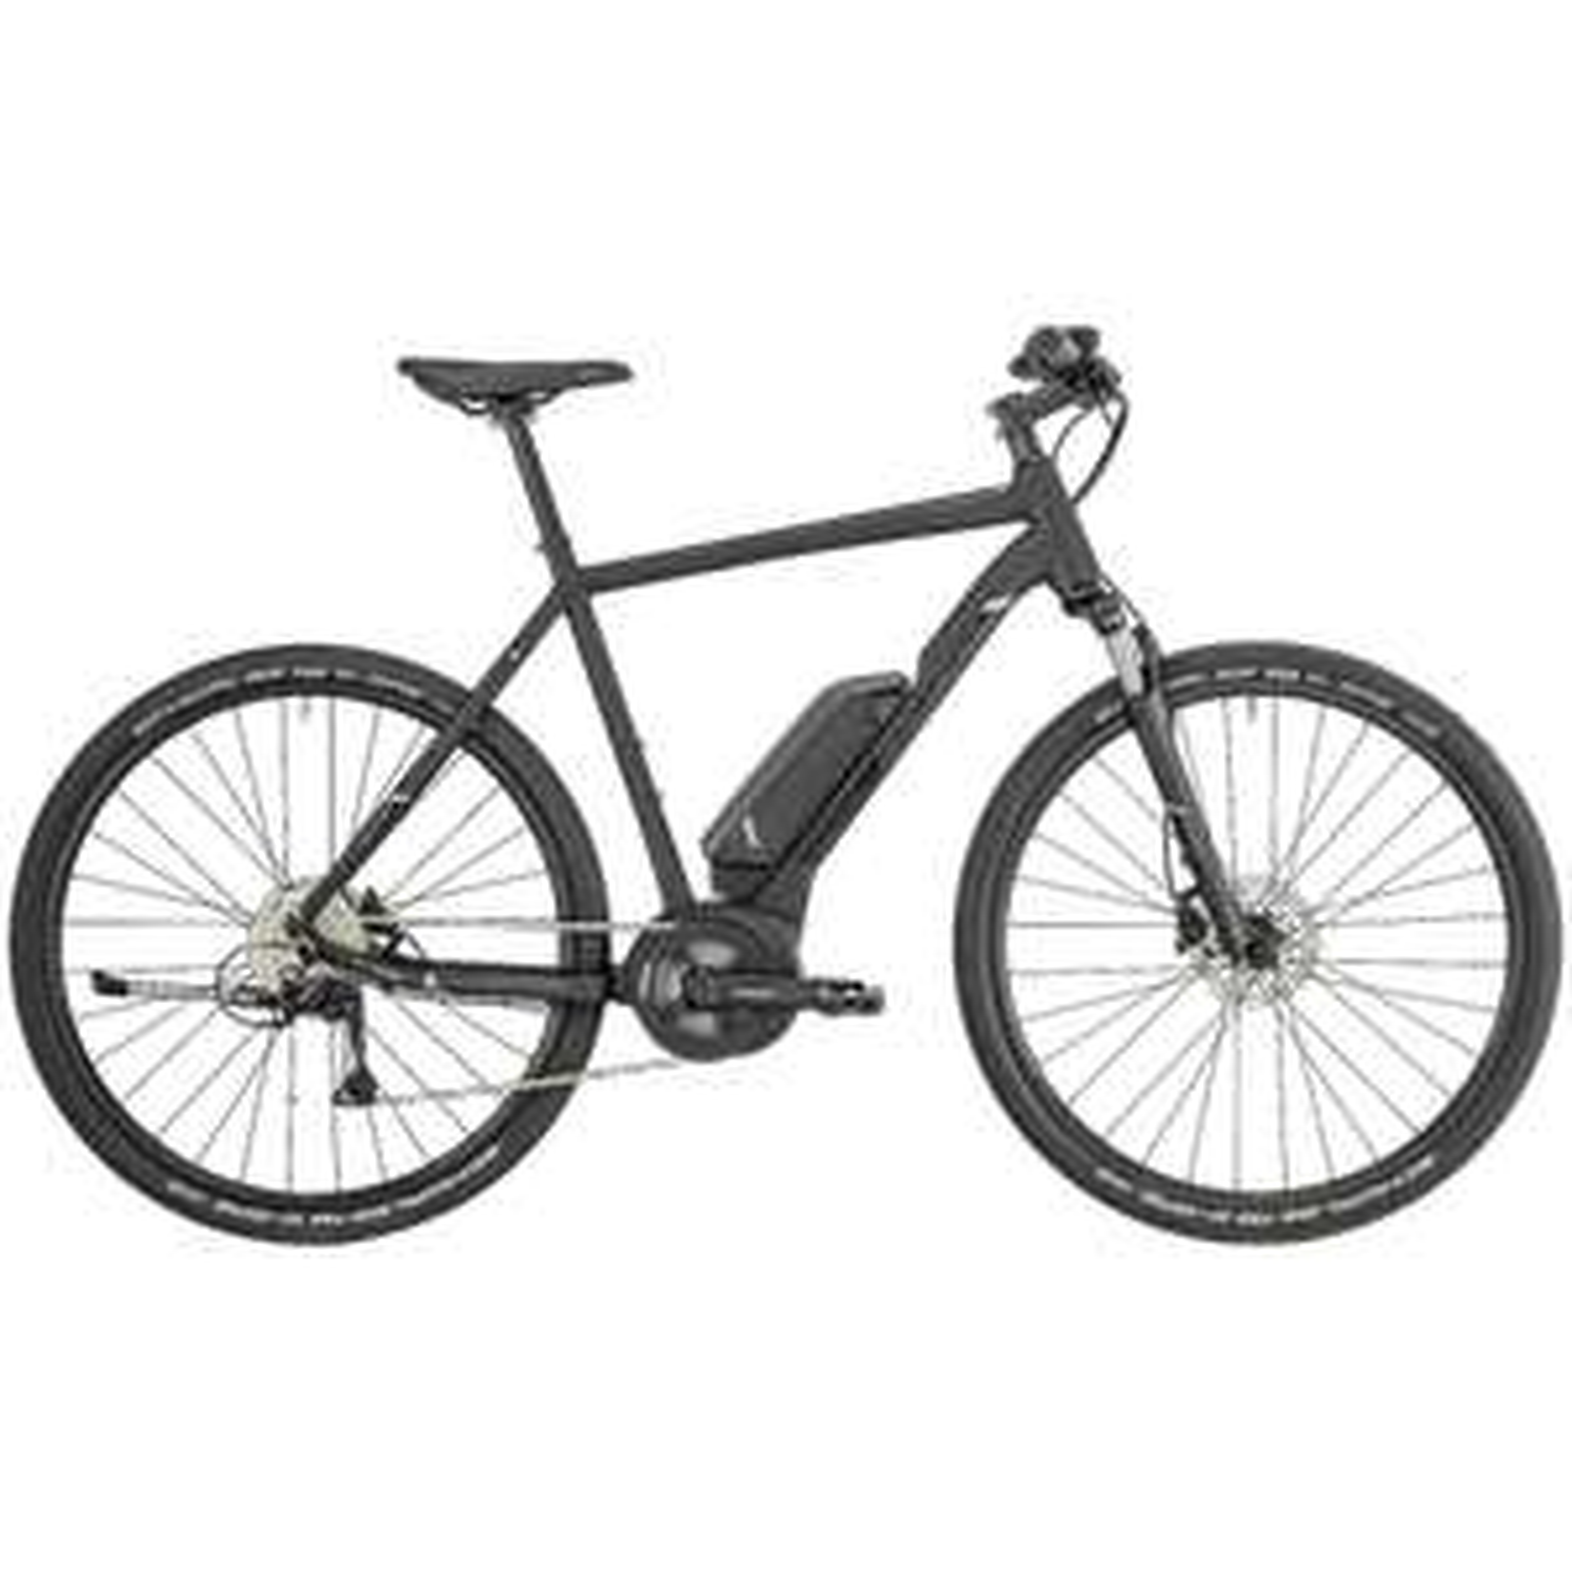 Bergamont E-Helix 6 Gent 2019 (Cross E-Bike mit Bosch Drive Unit Active Line Mittelmotor)